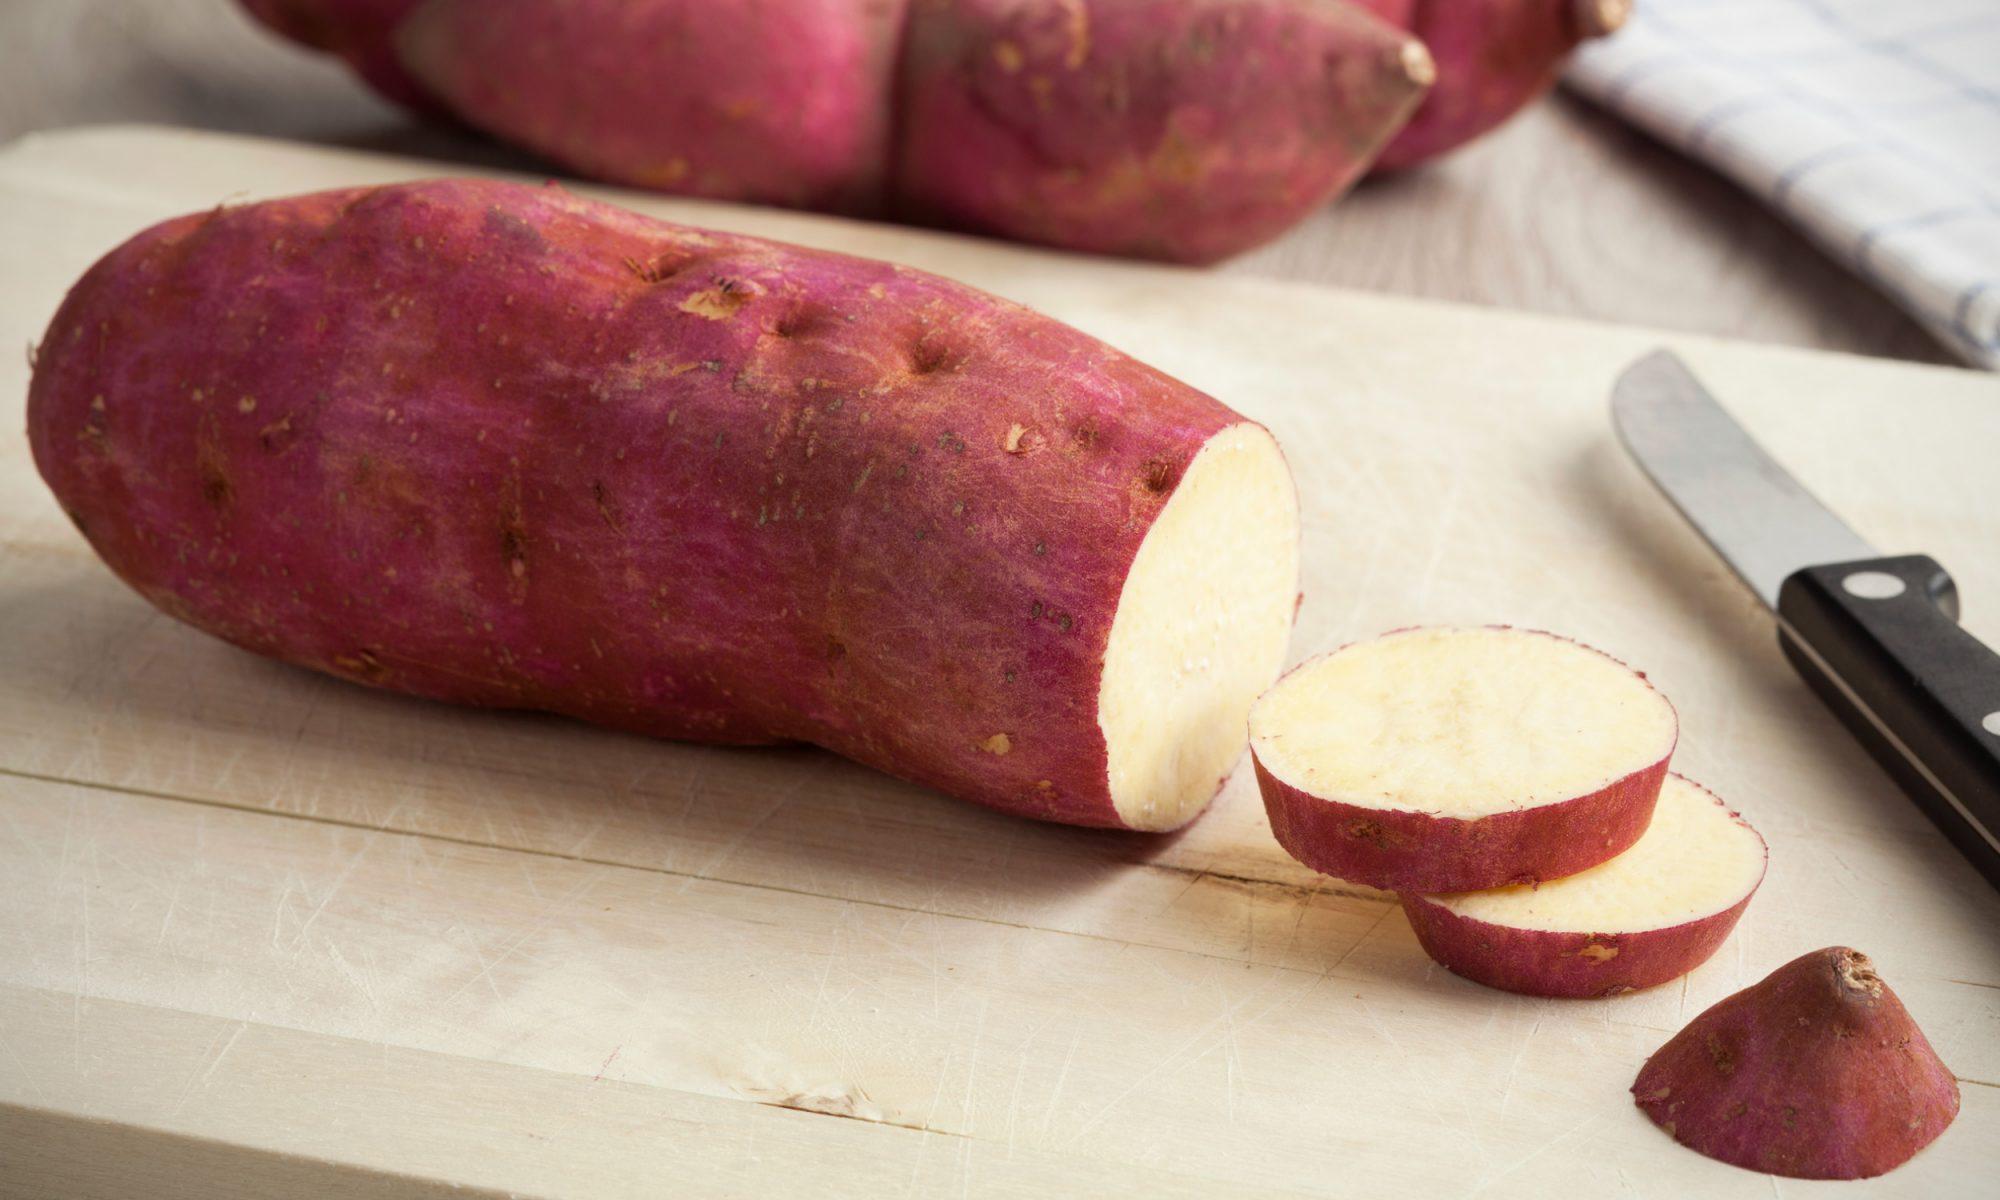 This Sweet Potato Kicks Bread's Butt